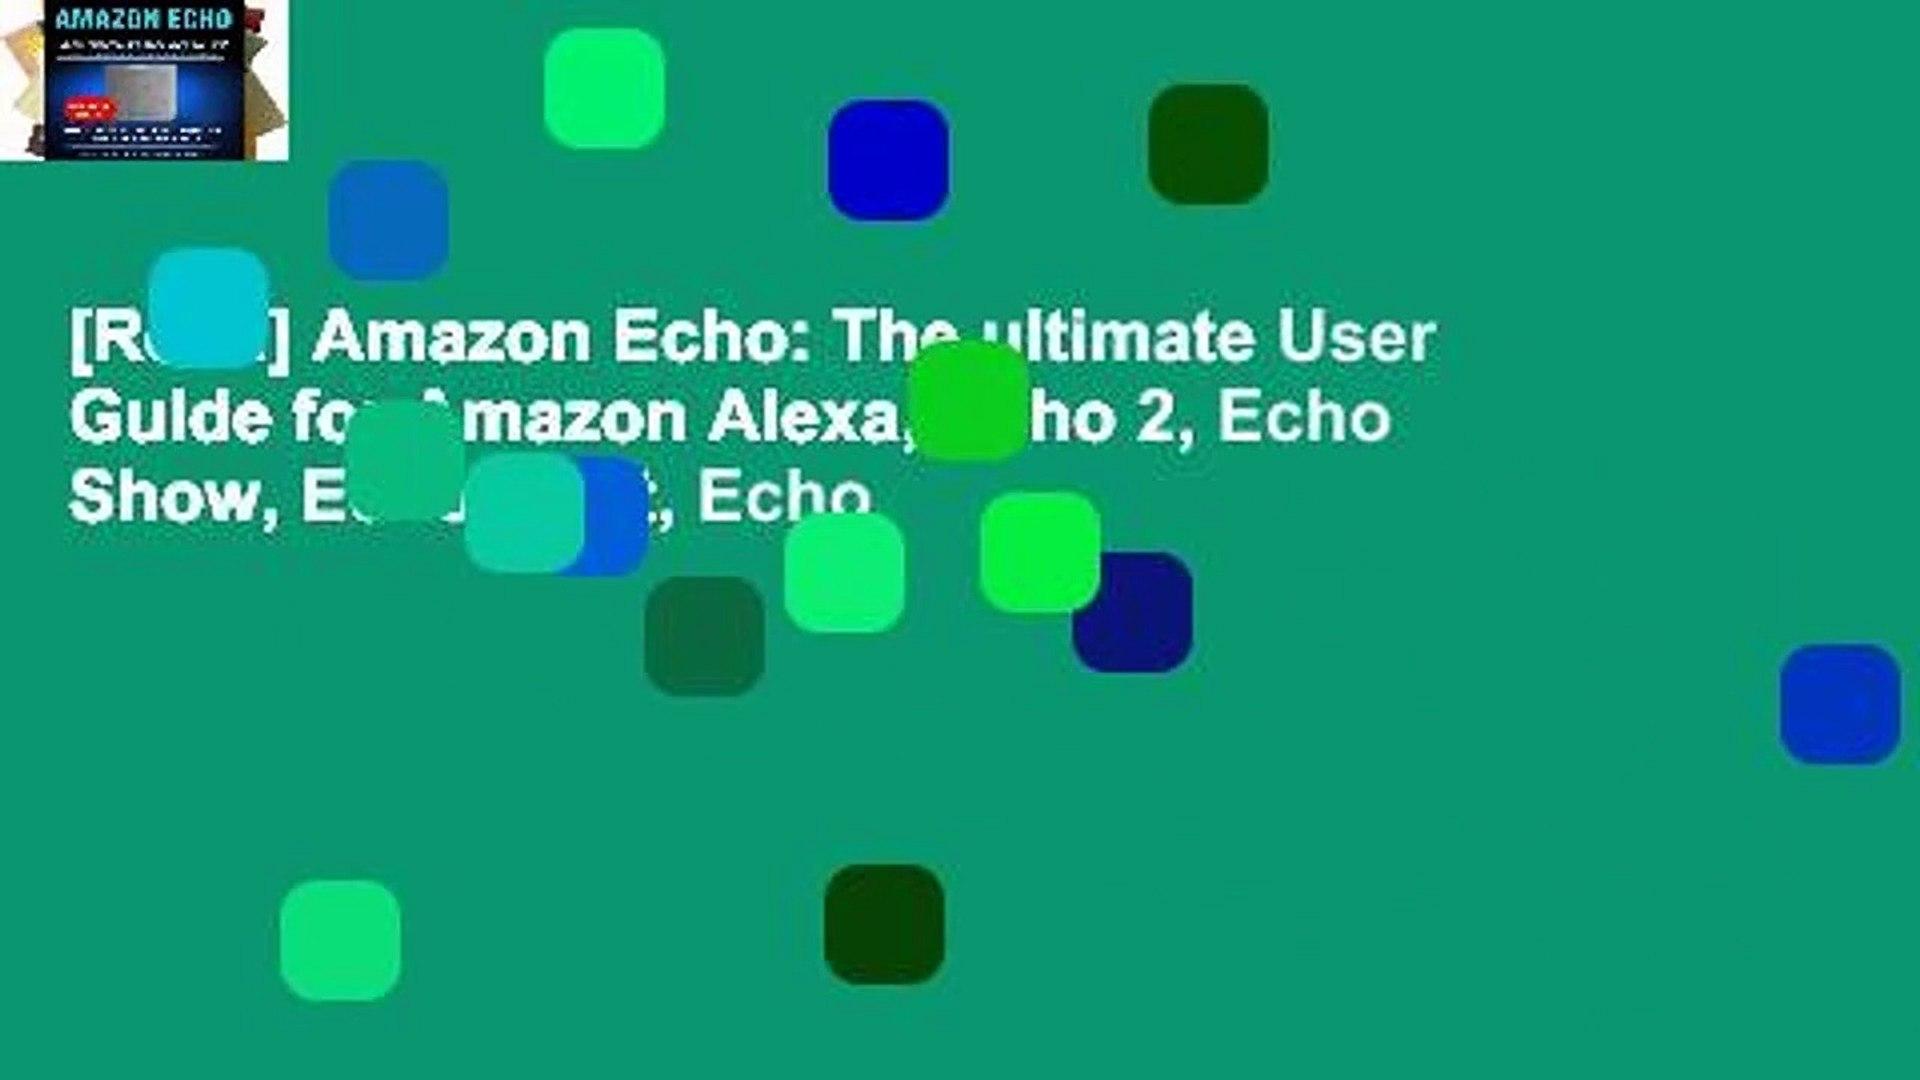 [Read] Amazon Echo: The ultimate User Guide for Amazon Alexa, Echo 2, Echo Show, Echo Spot, Echo